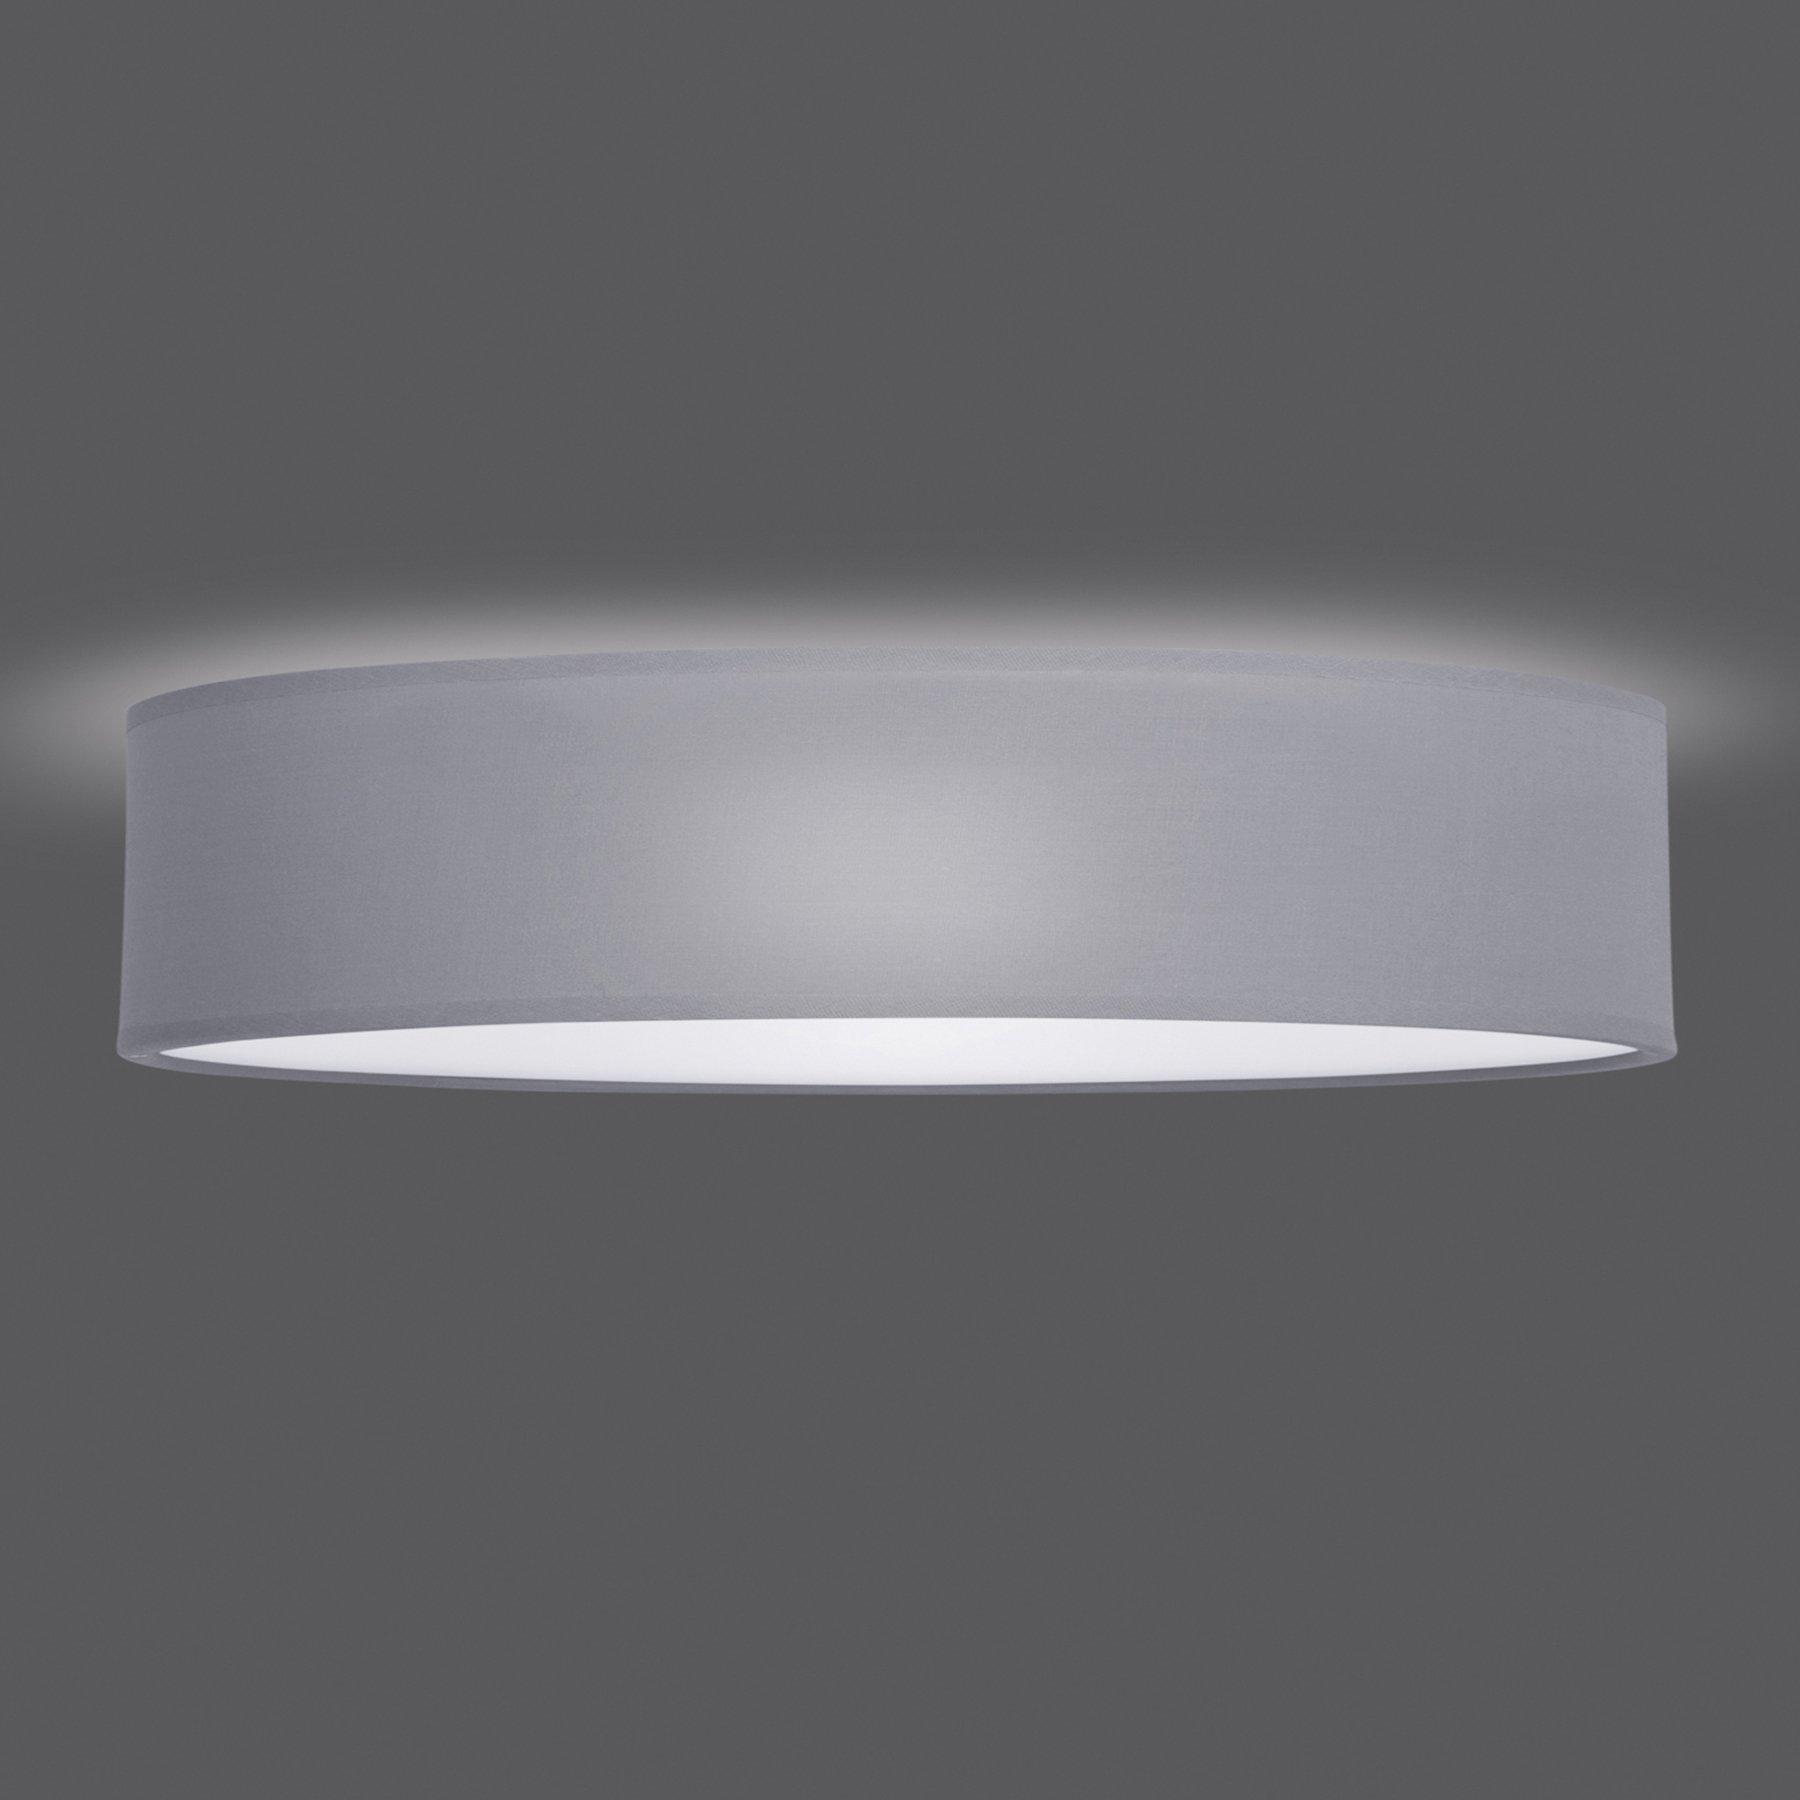 Taklampe Mia, grå, Ø 50 cm